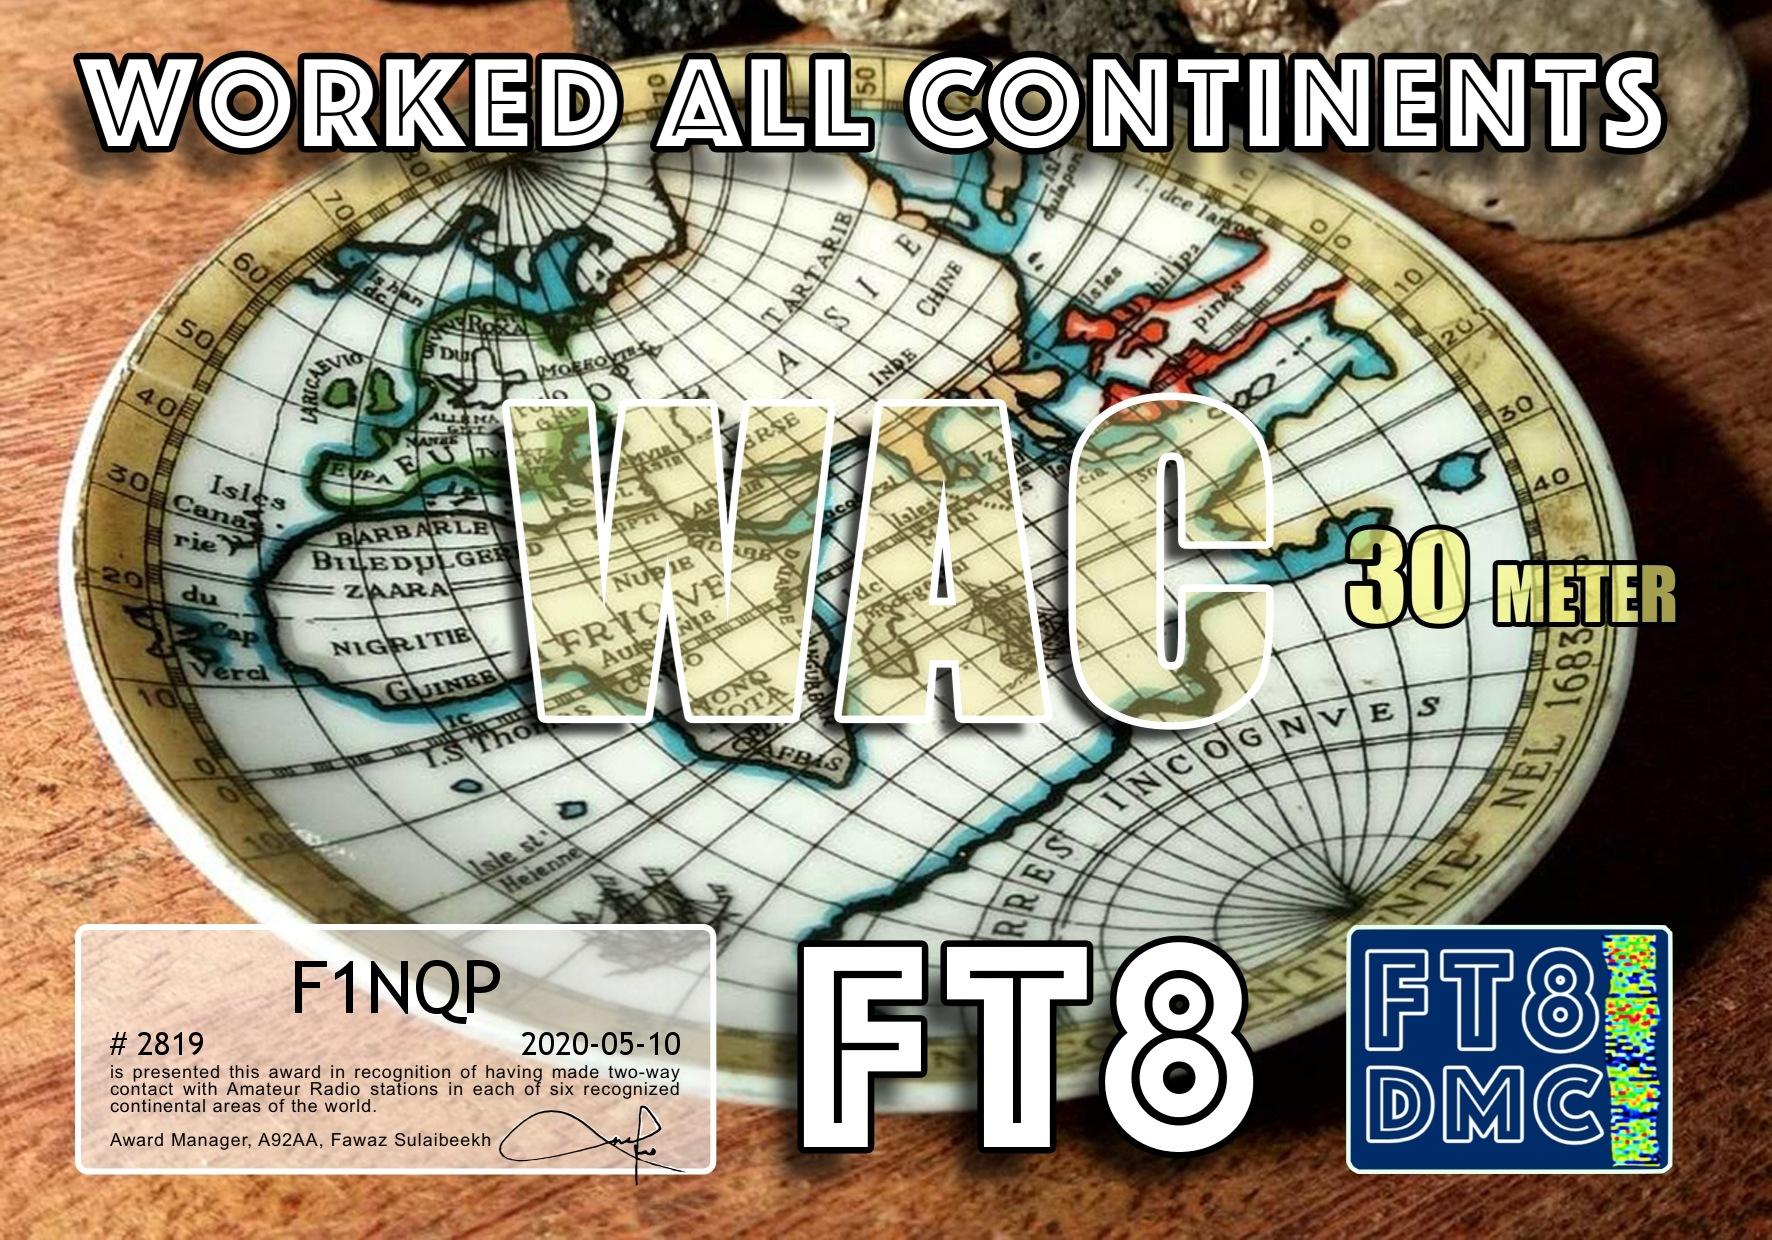 F1NQP-WAC-30M_FT8DMC.jpg